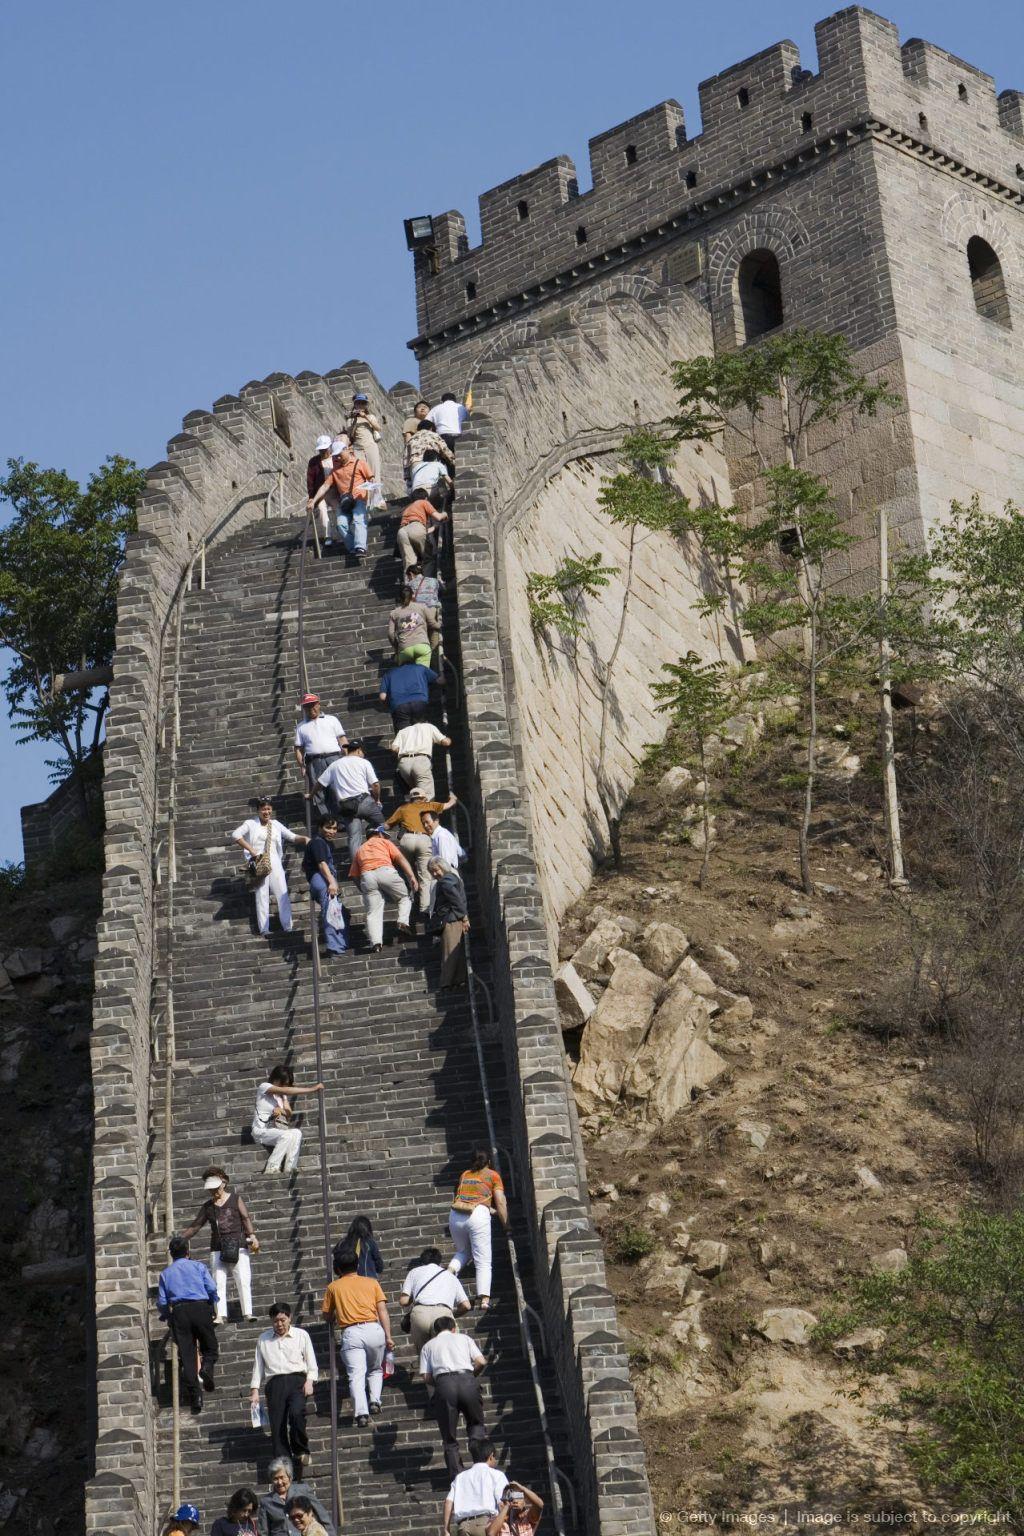 china badaling great wall of china tourists climbing on the great wall of china id=36193